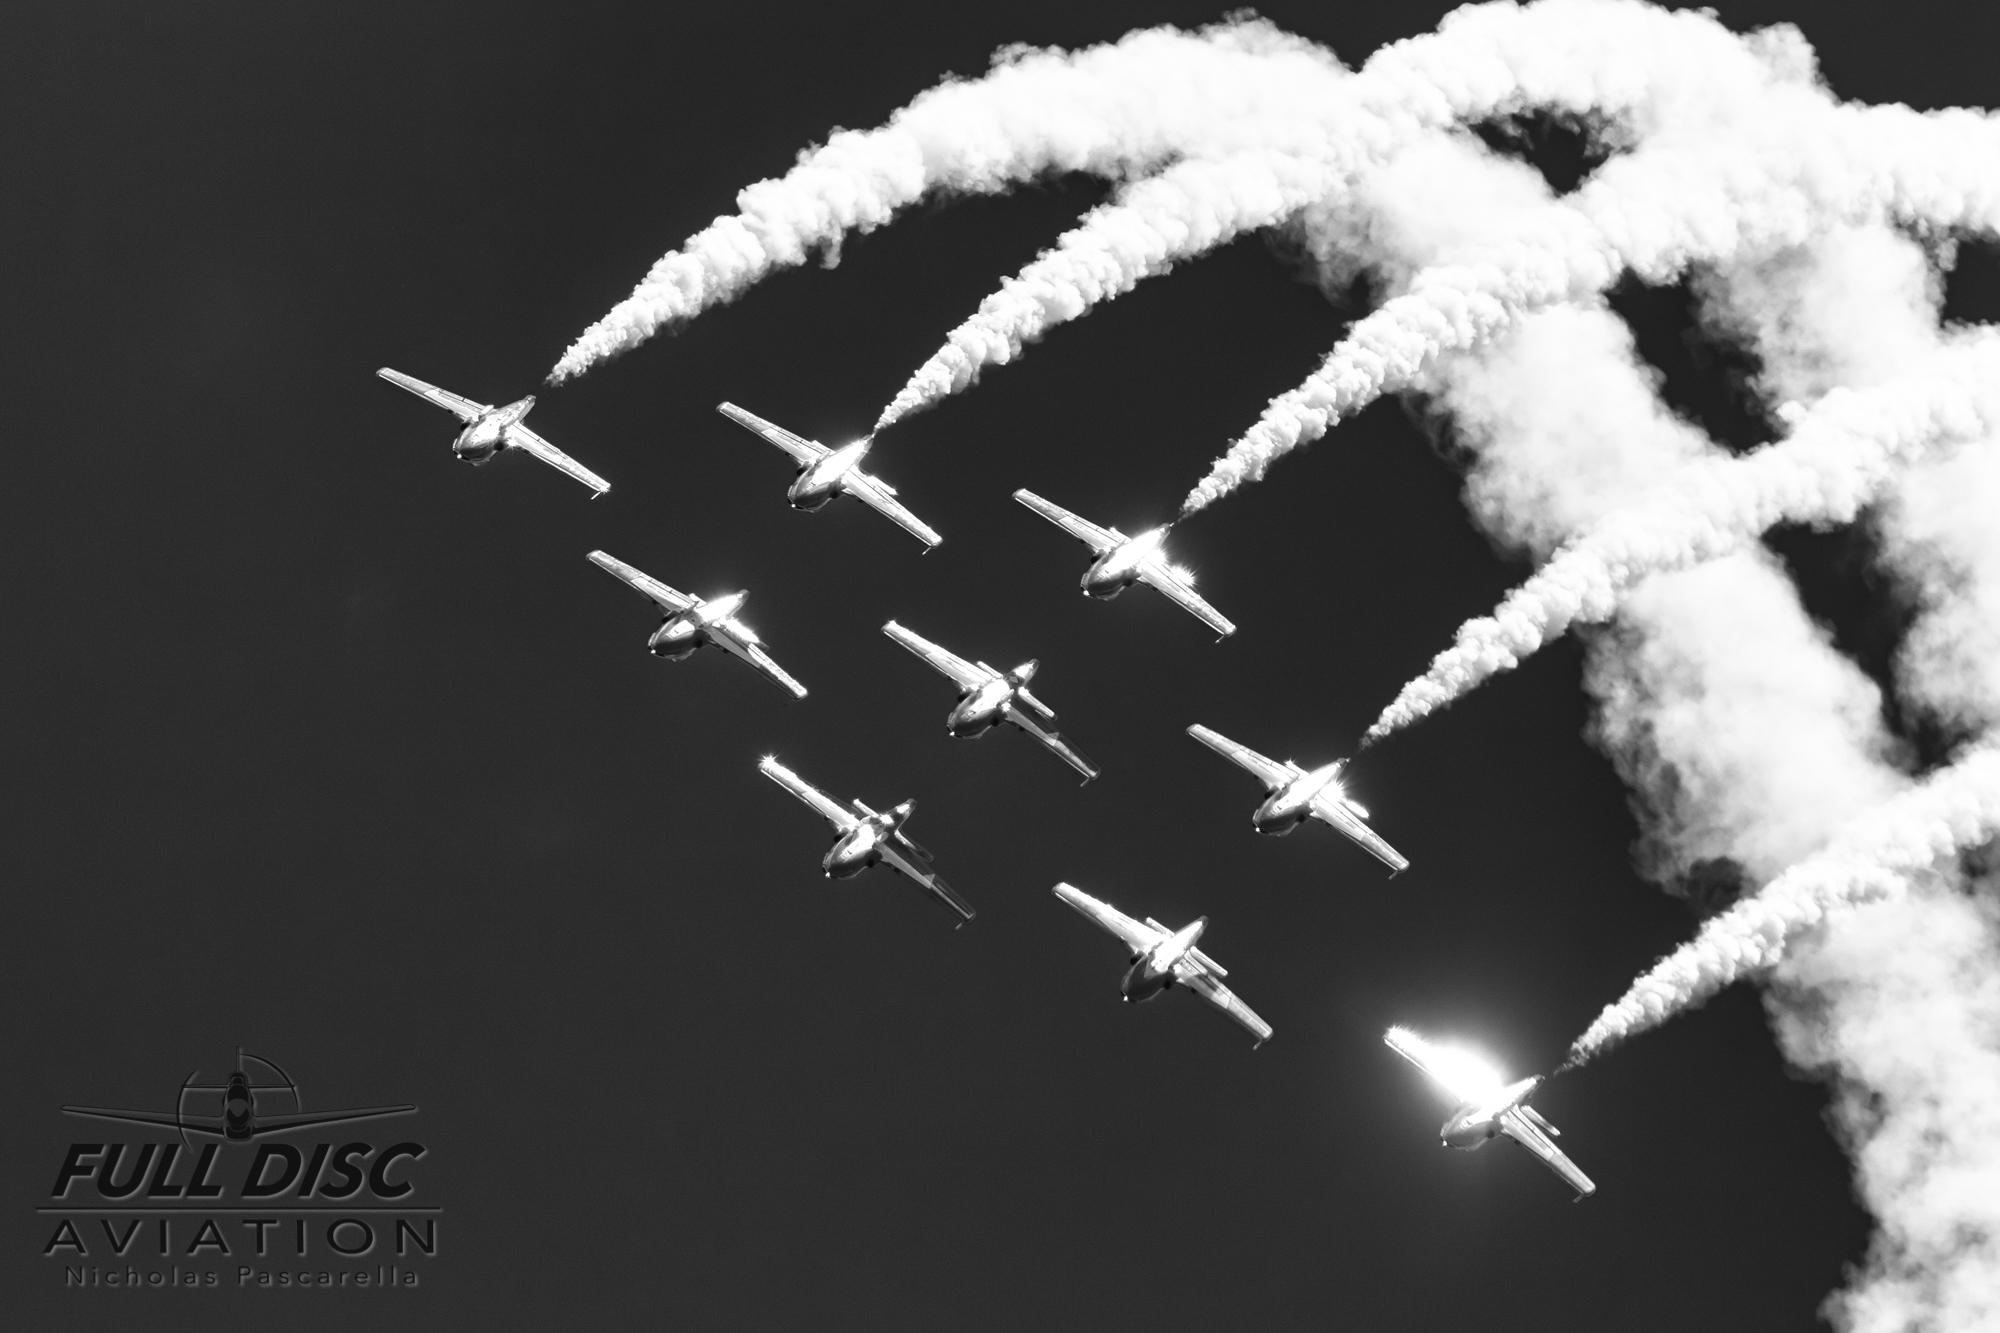 nickpascarella_fulldiscaviation_oceancityairshow_aviation_snowbirds_reflection.jpg